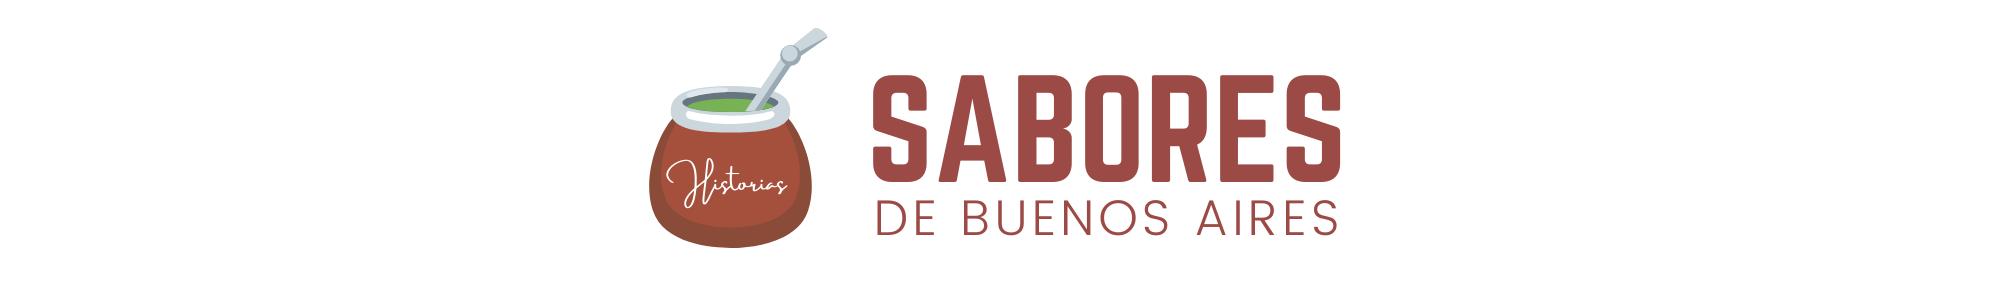 Sabores de Buenos Aires